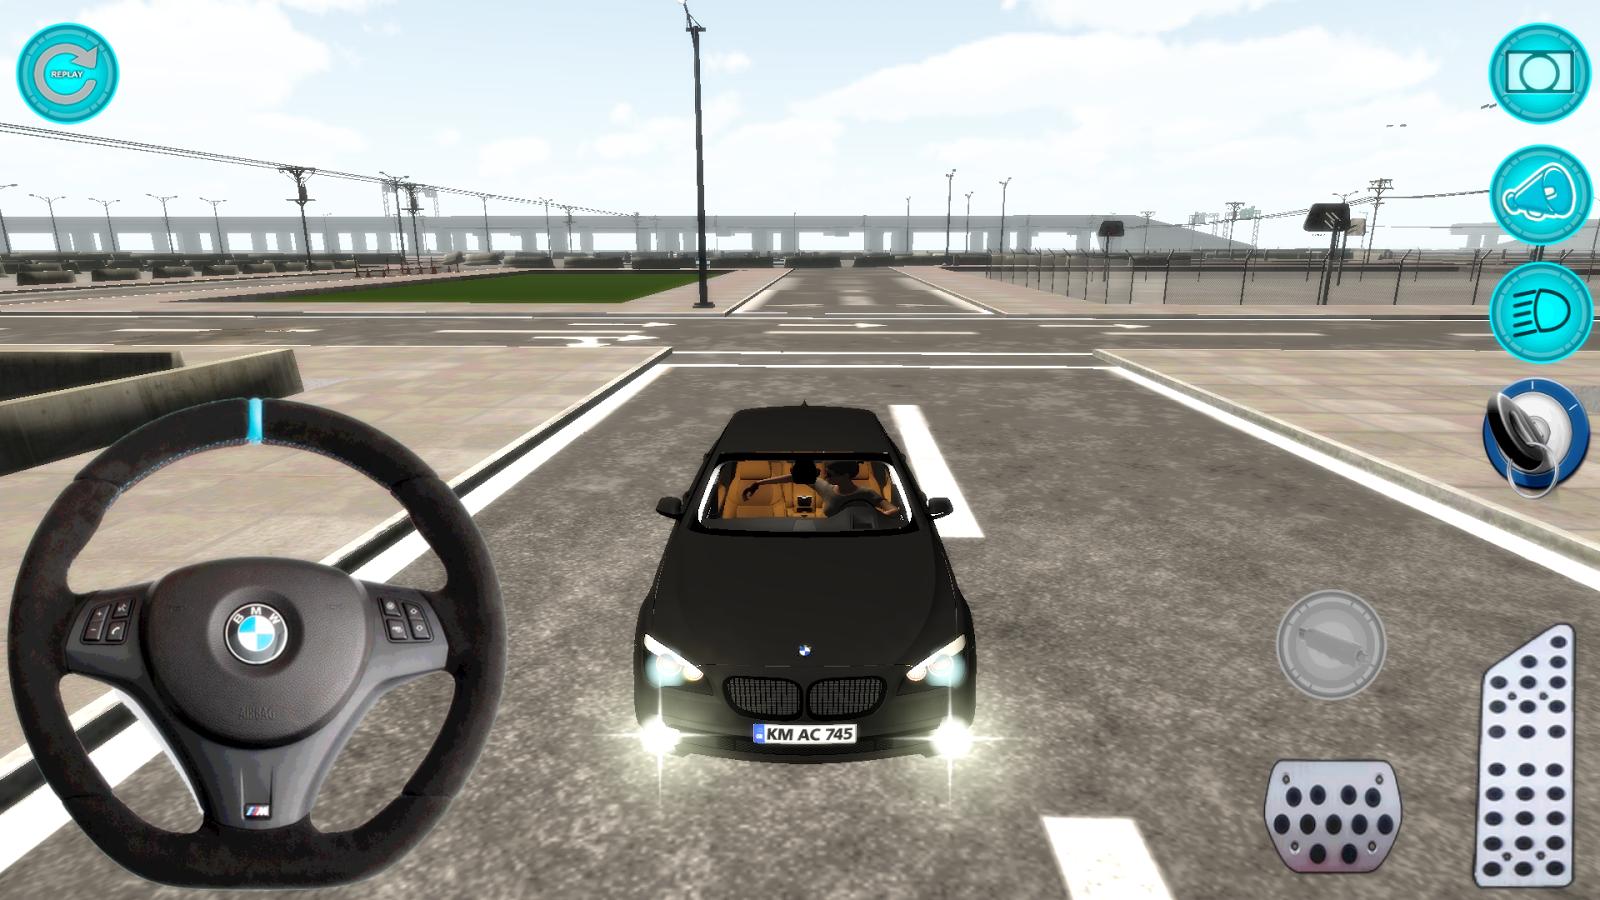 Euro Truck Simulator 2 Oyunlar Oyna Araba Oyunlar